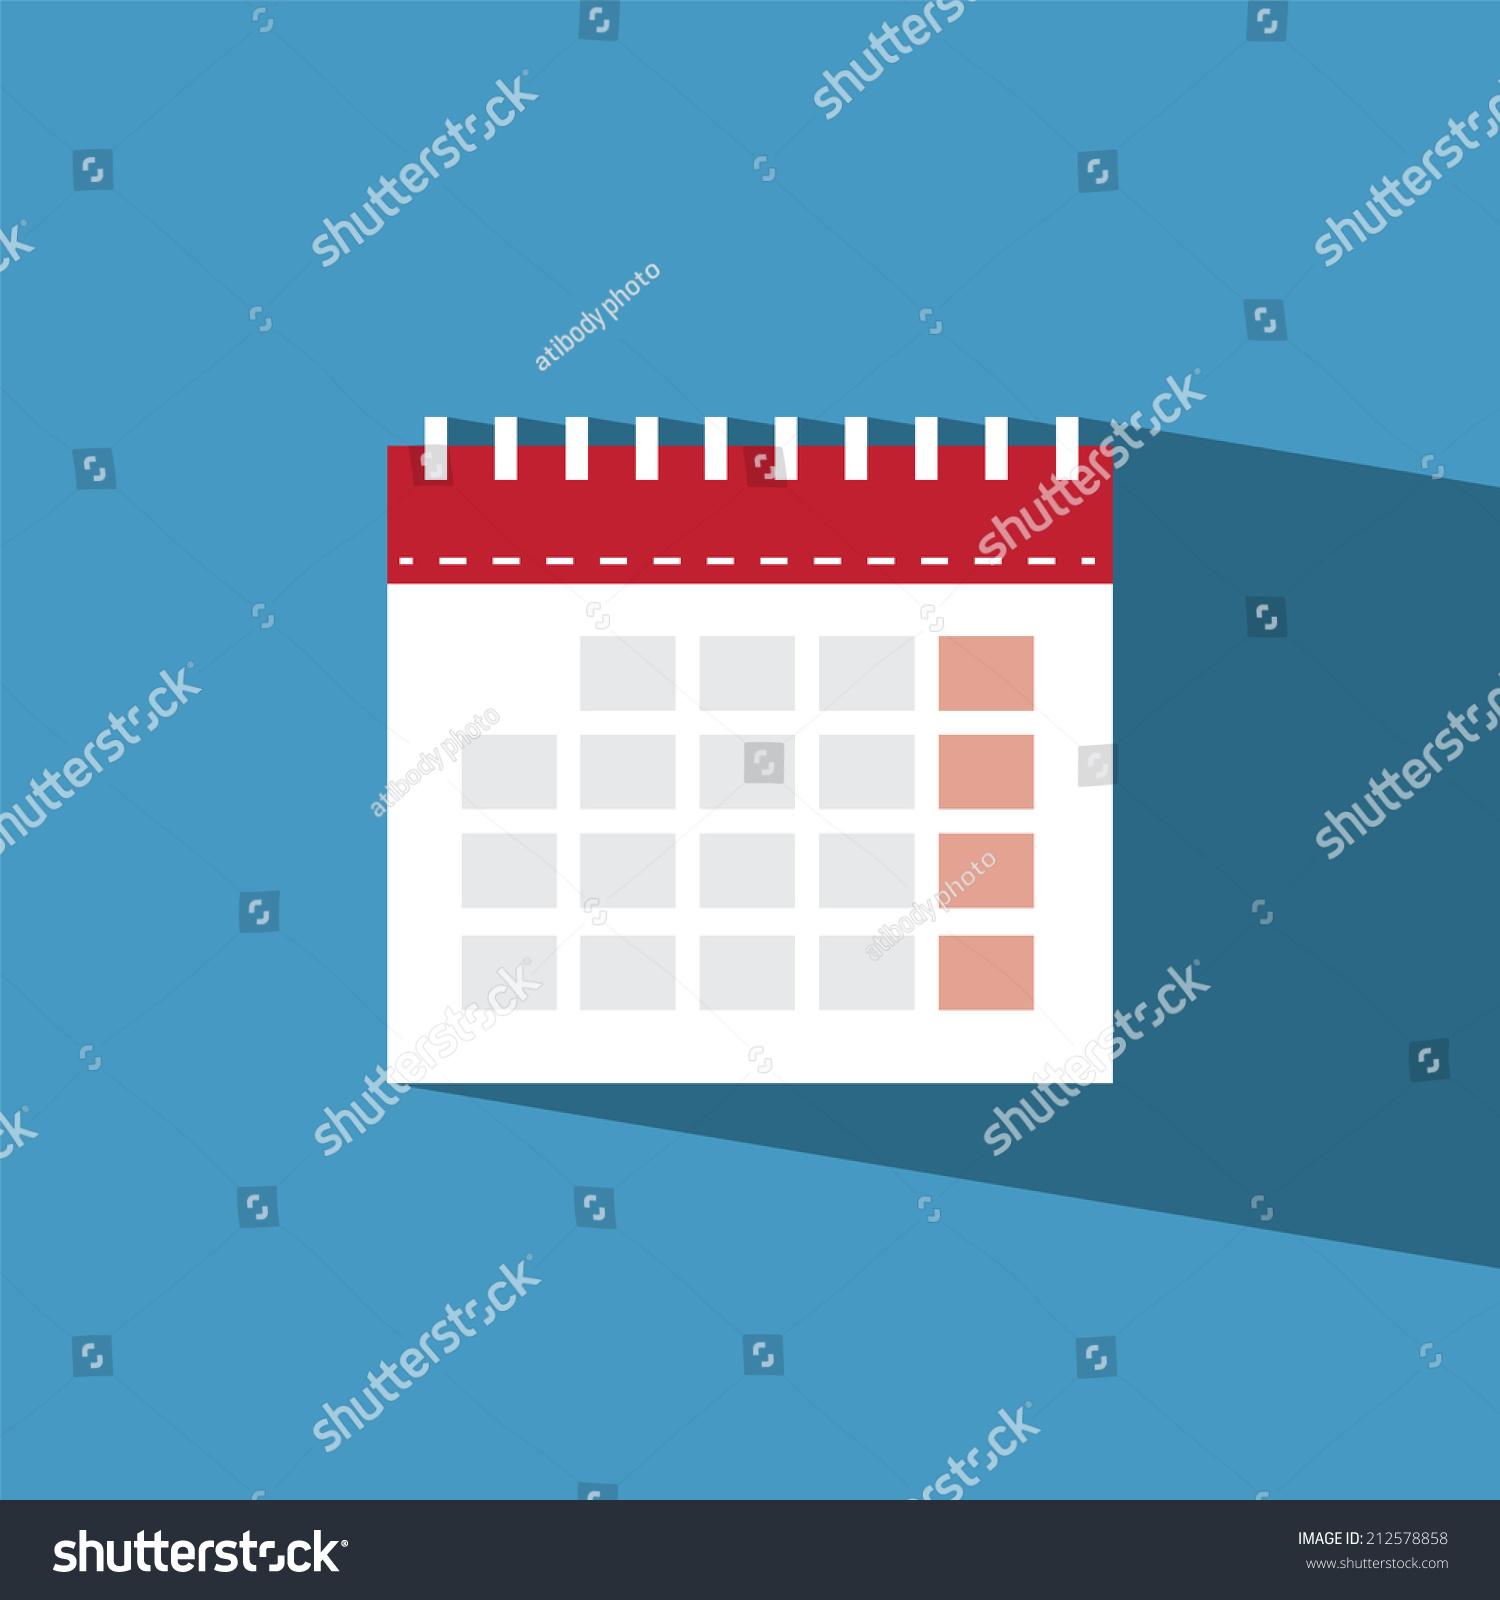 Calendar Flat Illustration : Calendar flat icon vector illustration eps